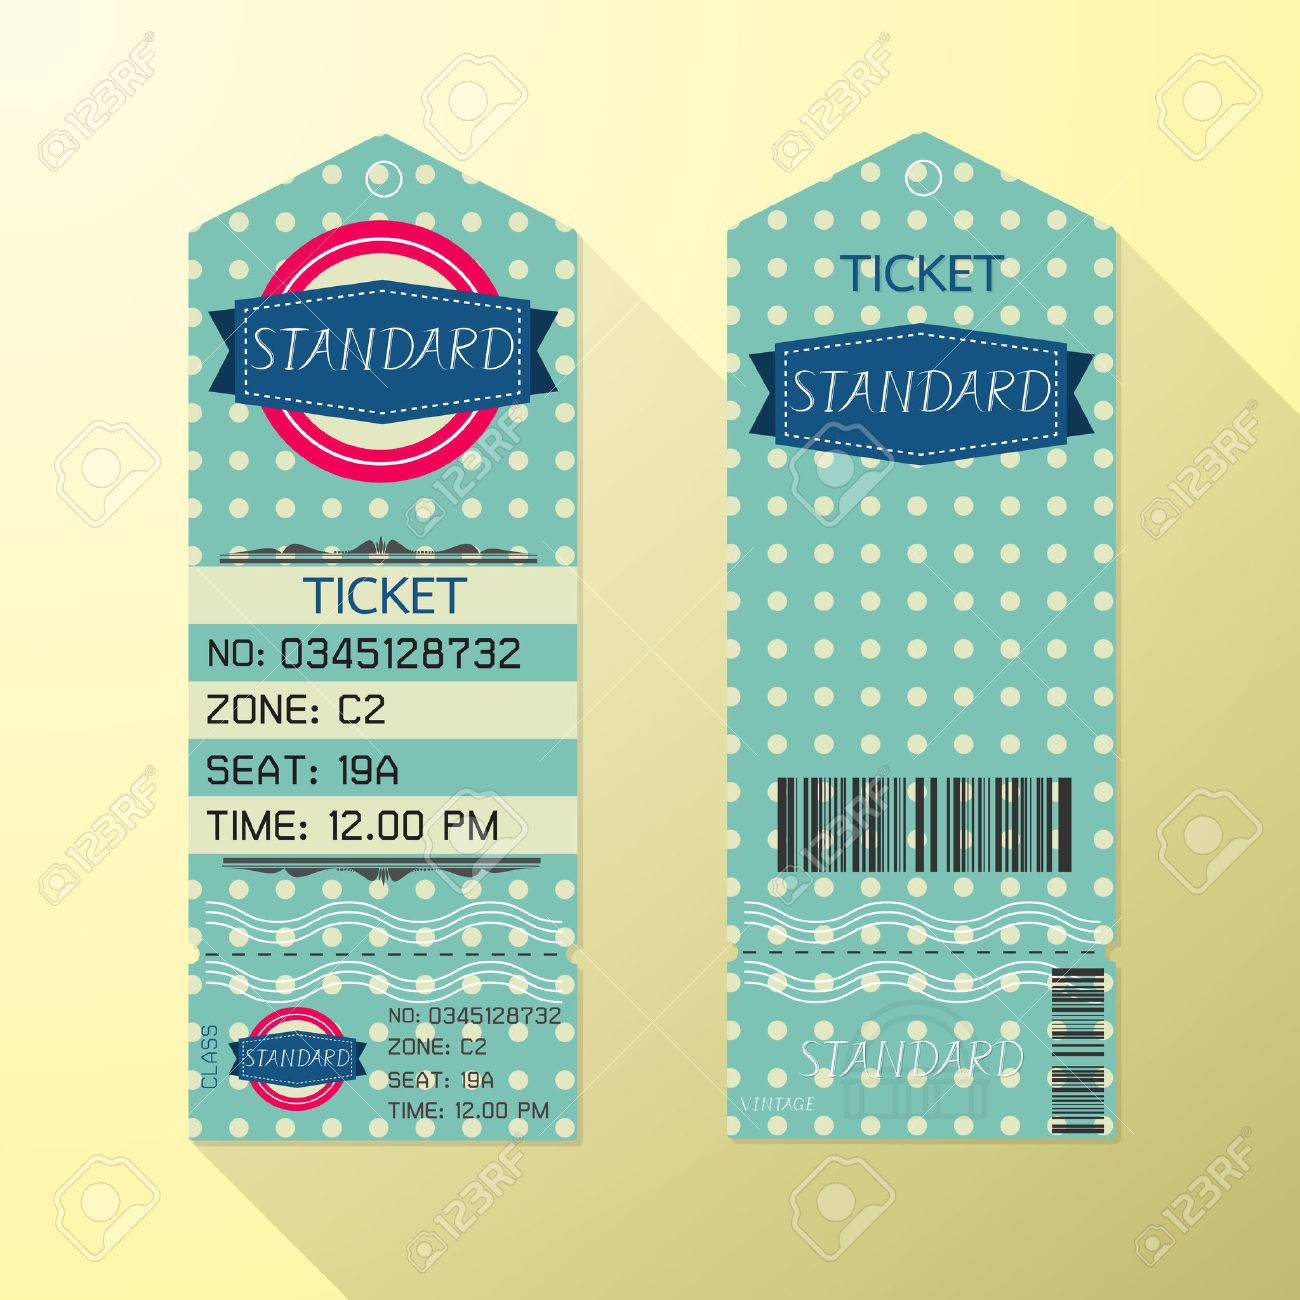 free ticket design template